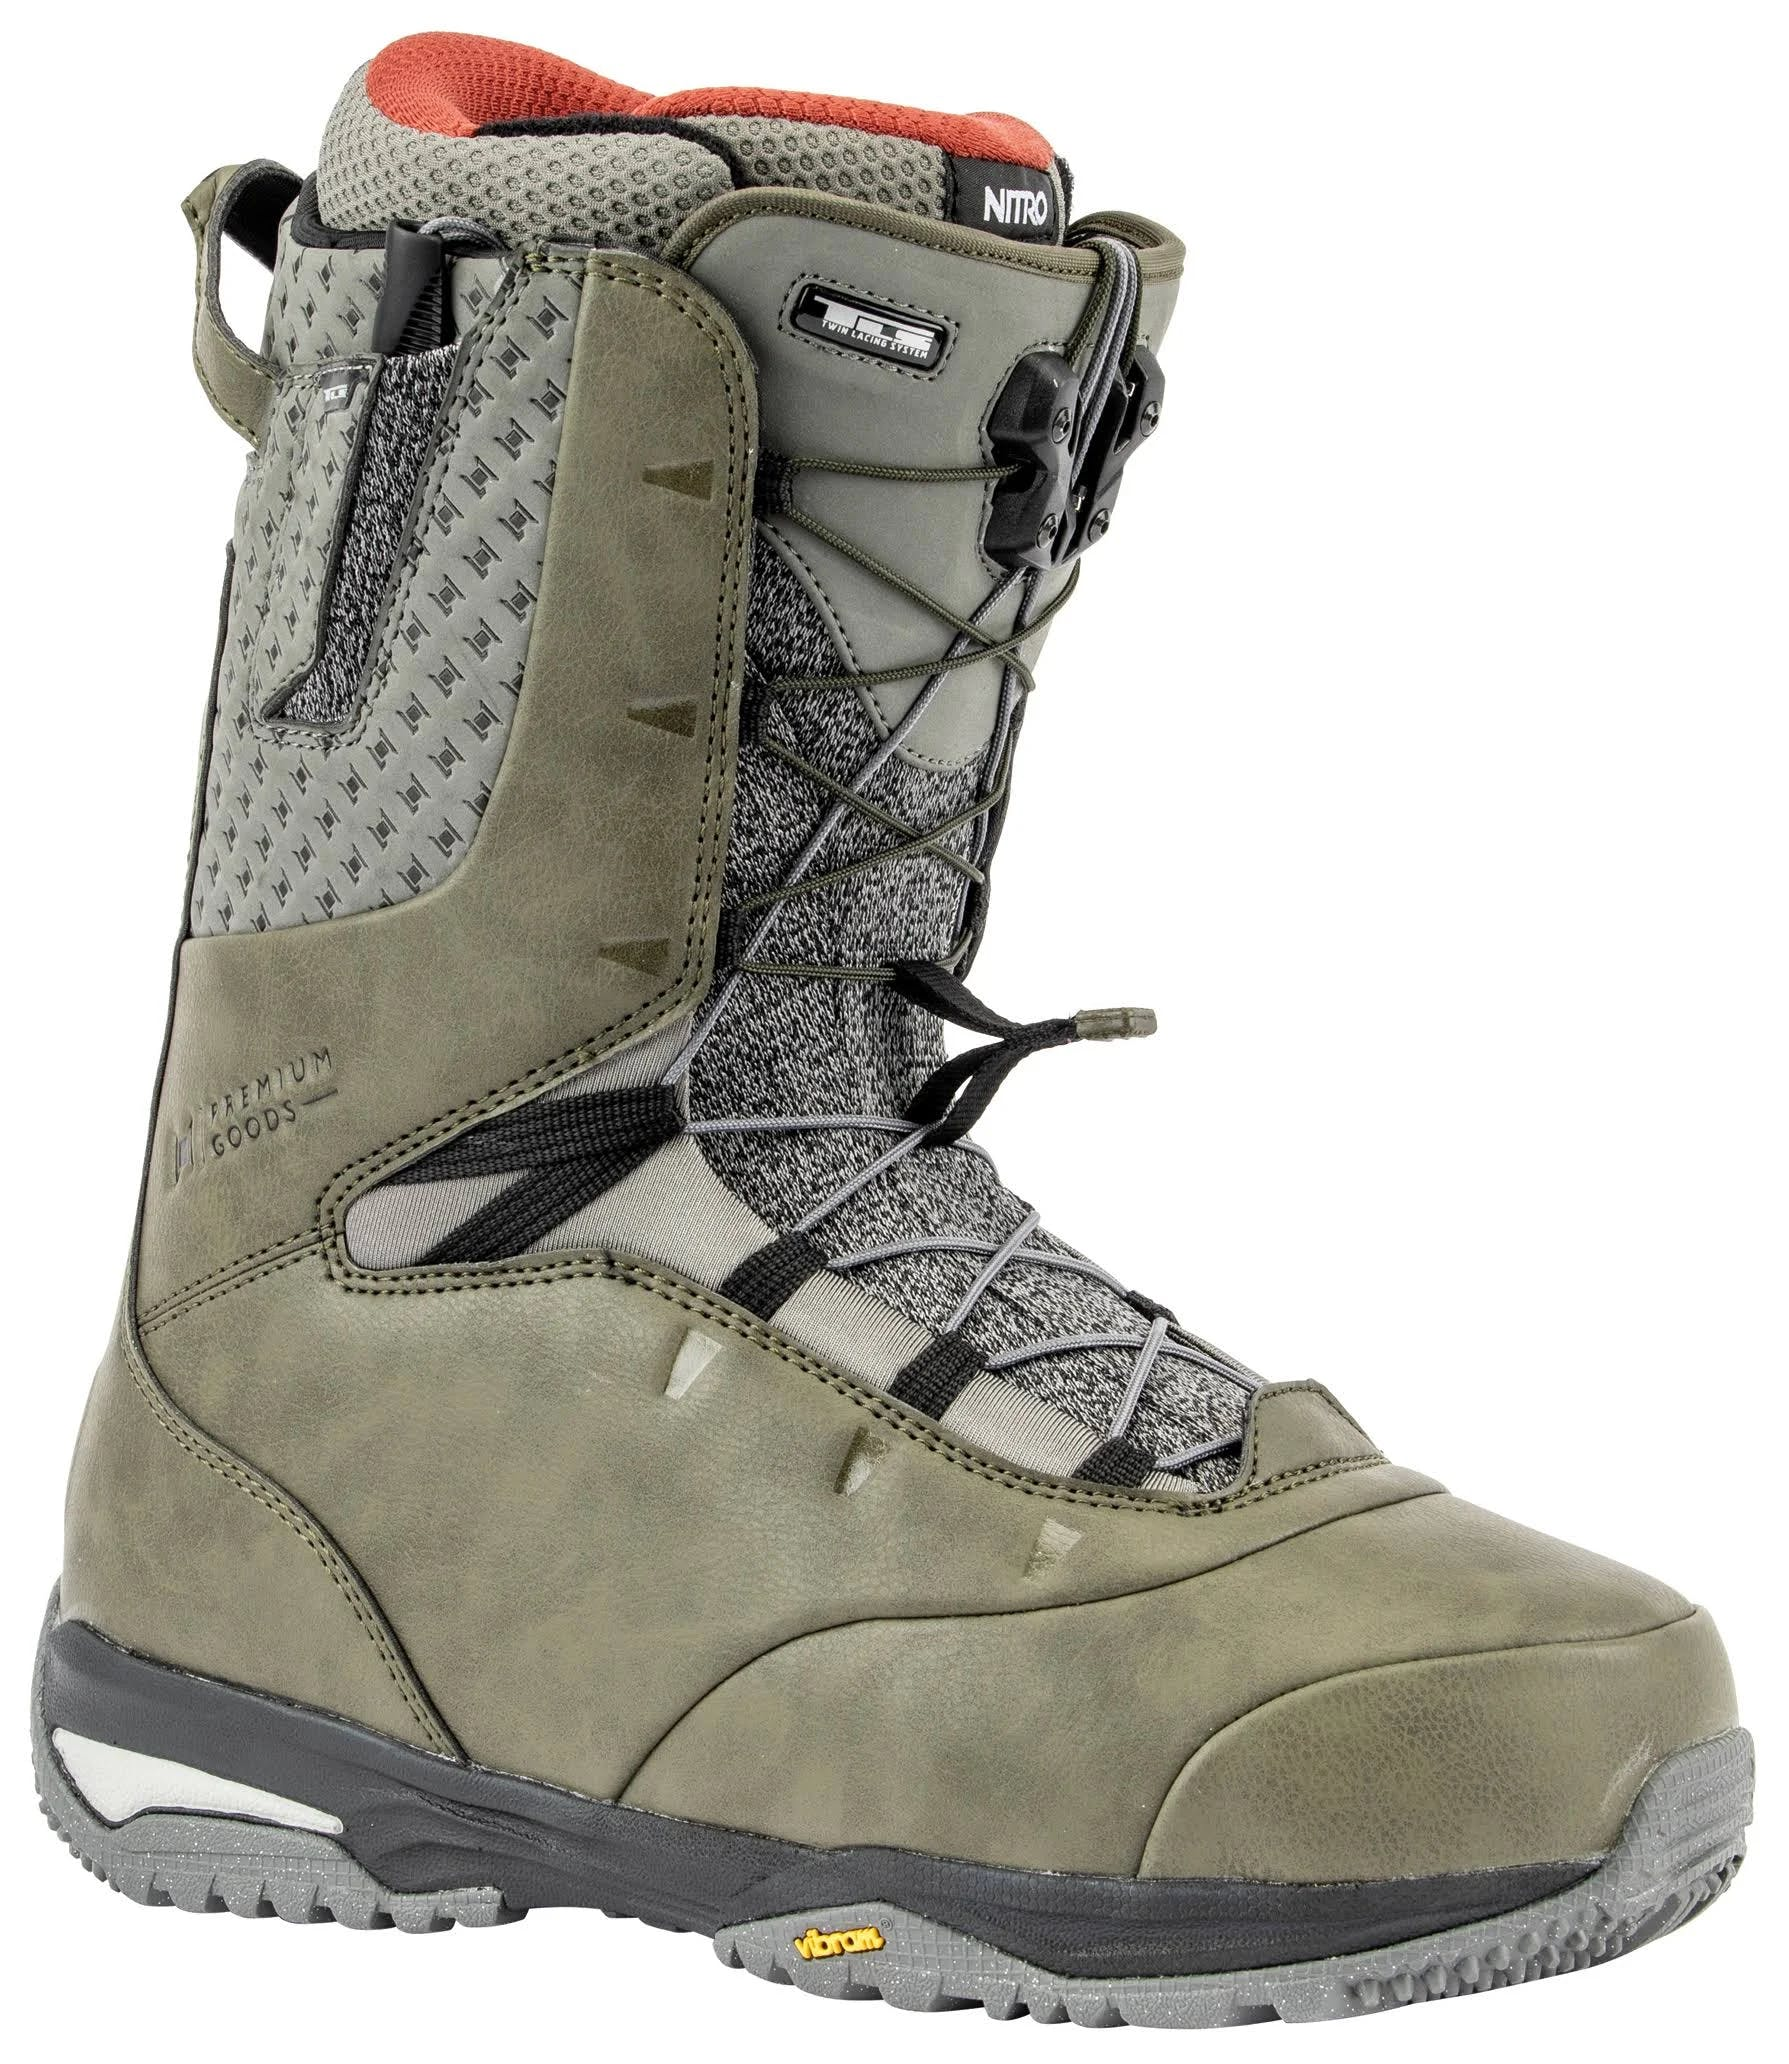 Nitro Venture Pro TLS Snowboard Boots  Nitro X L1 9 · 2020